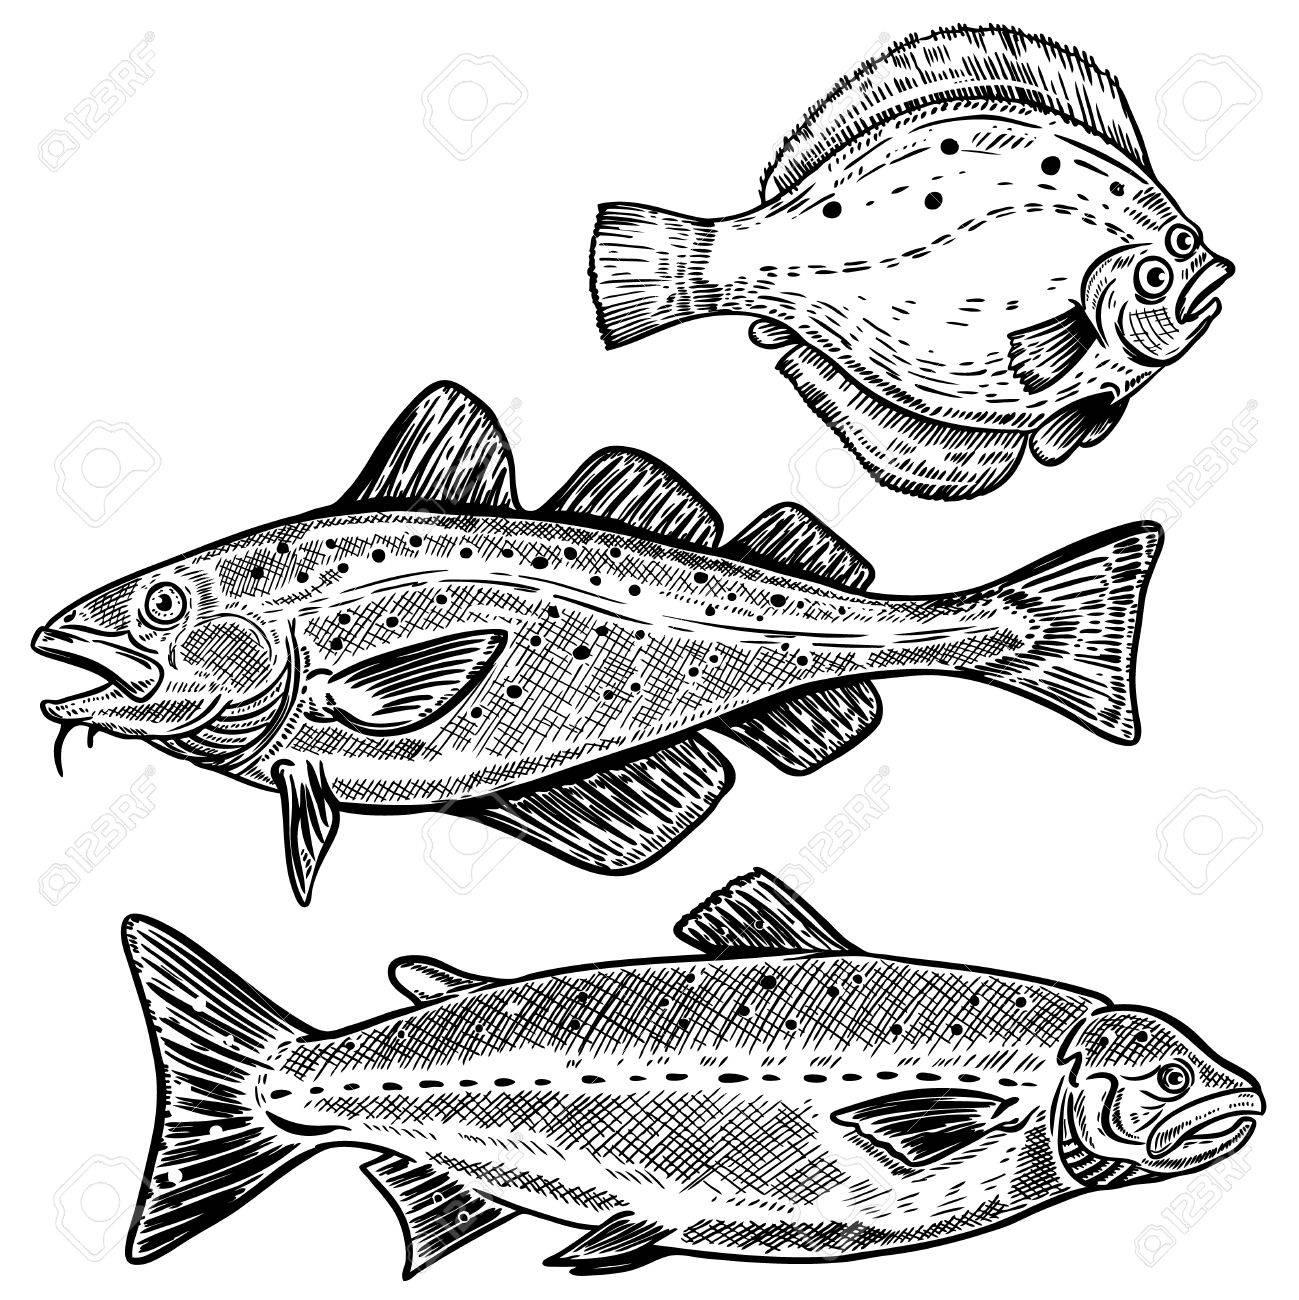 1299x1300 Cod, Salmon, Flounder Fish Illustrations Isolated On White